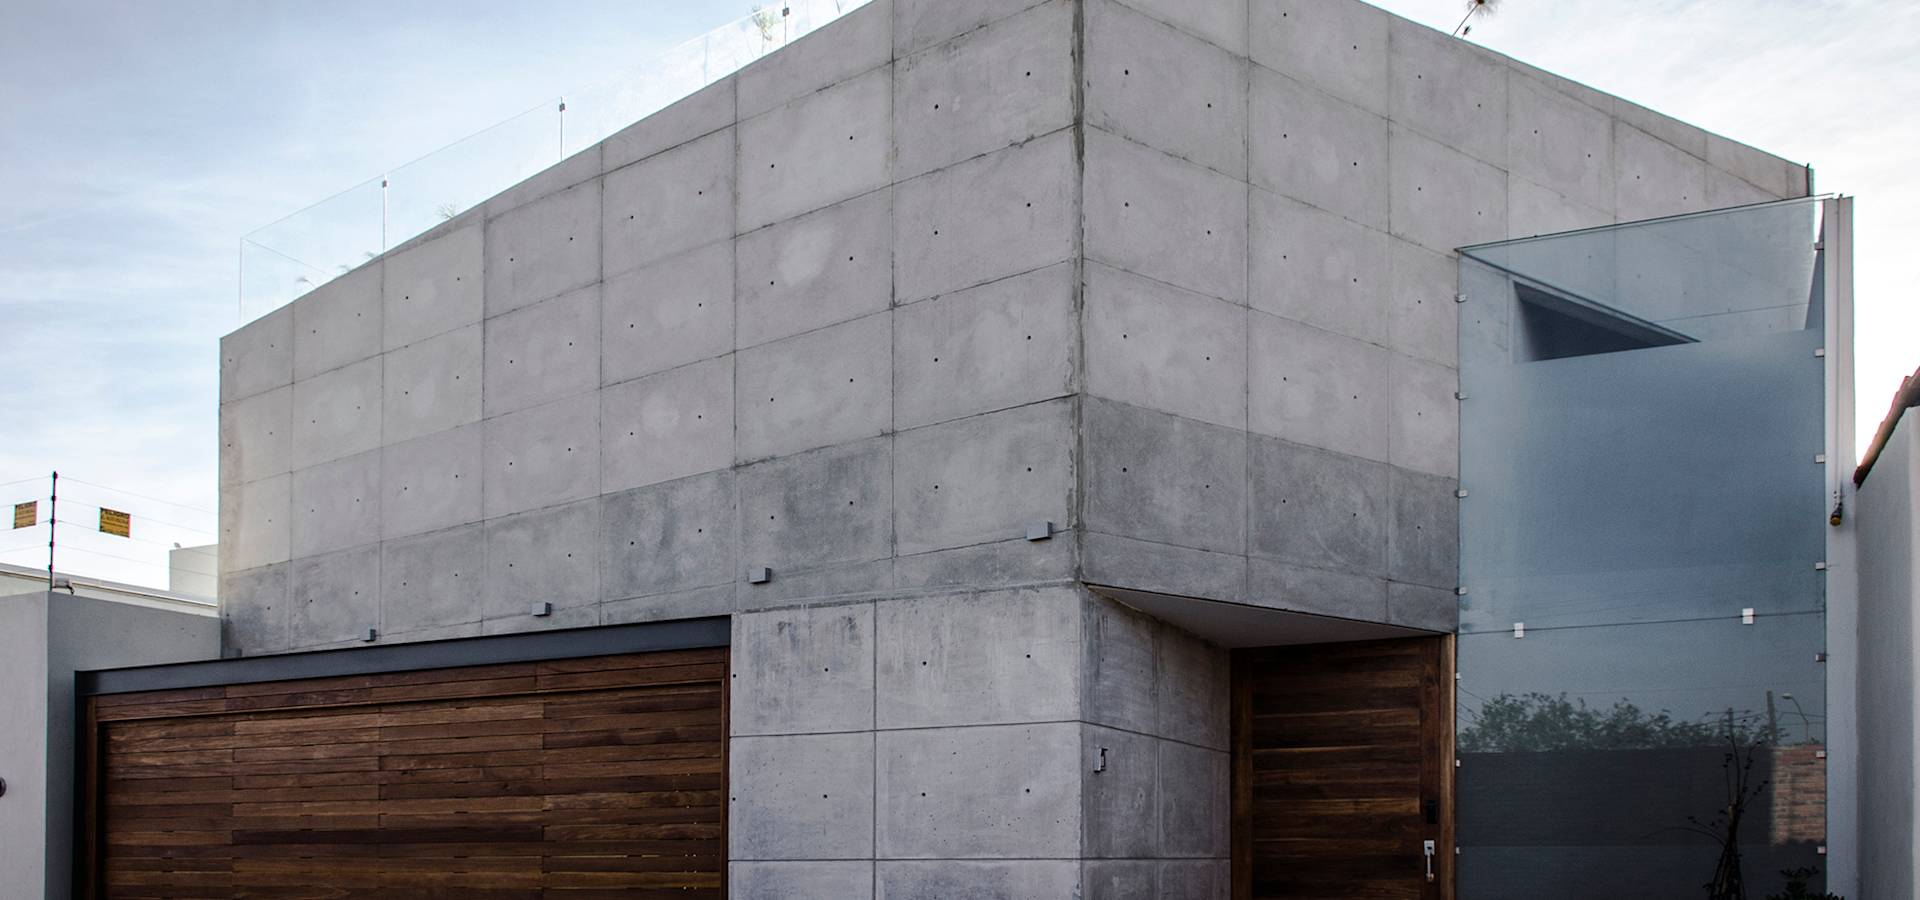 Oscar hern ndez fotograf a de arquitectura fot grafos for Diseno de interiores tijuana